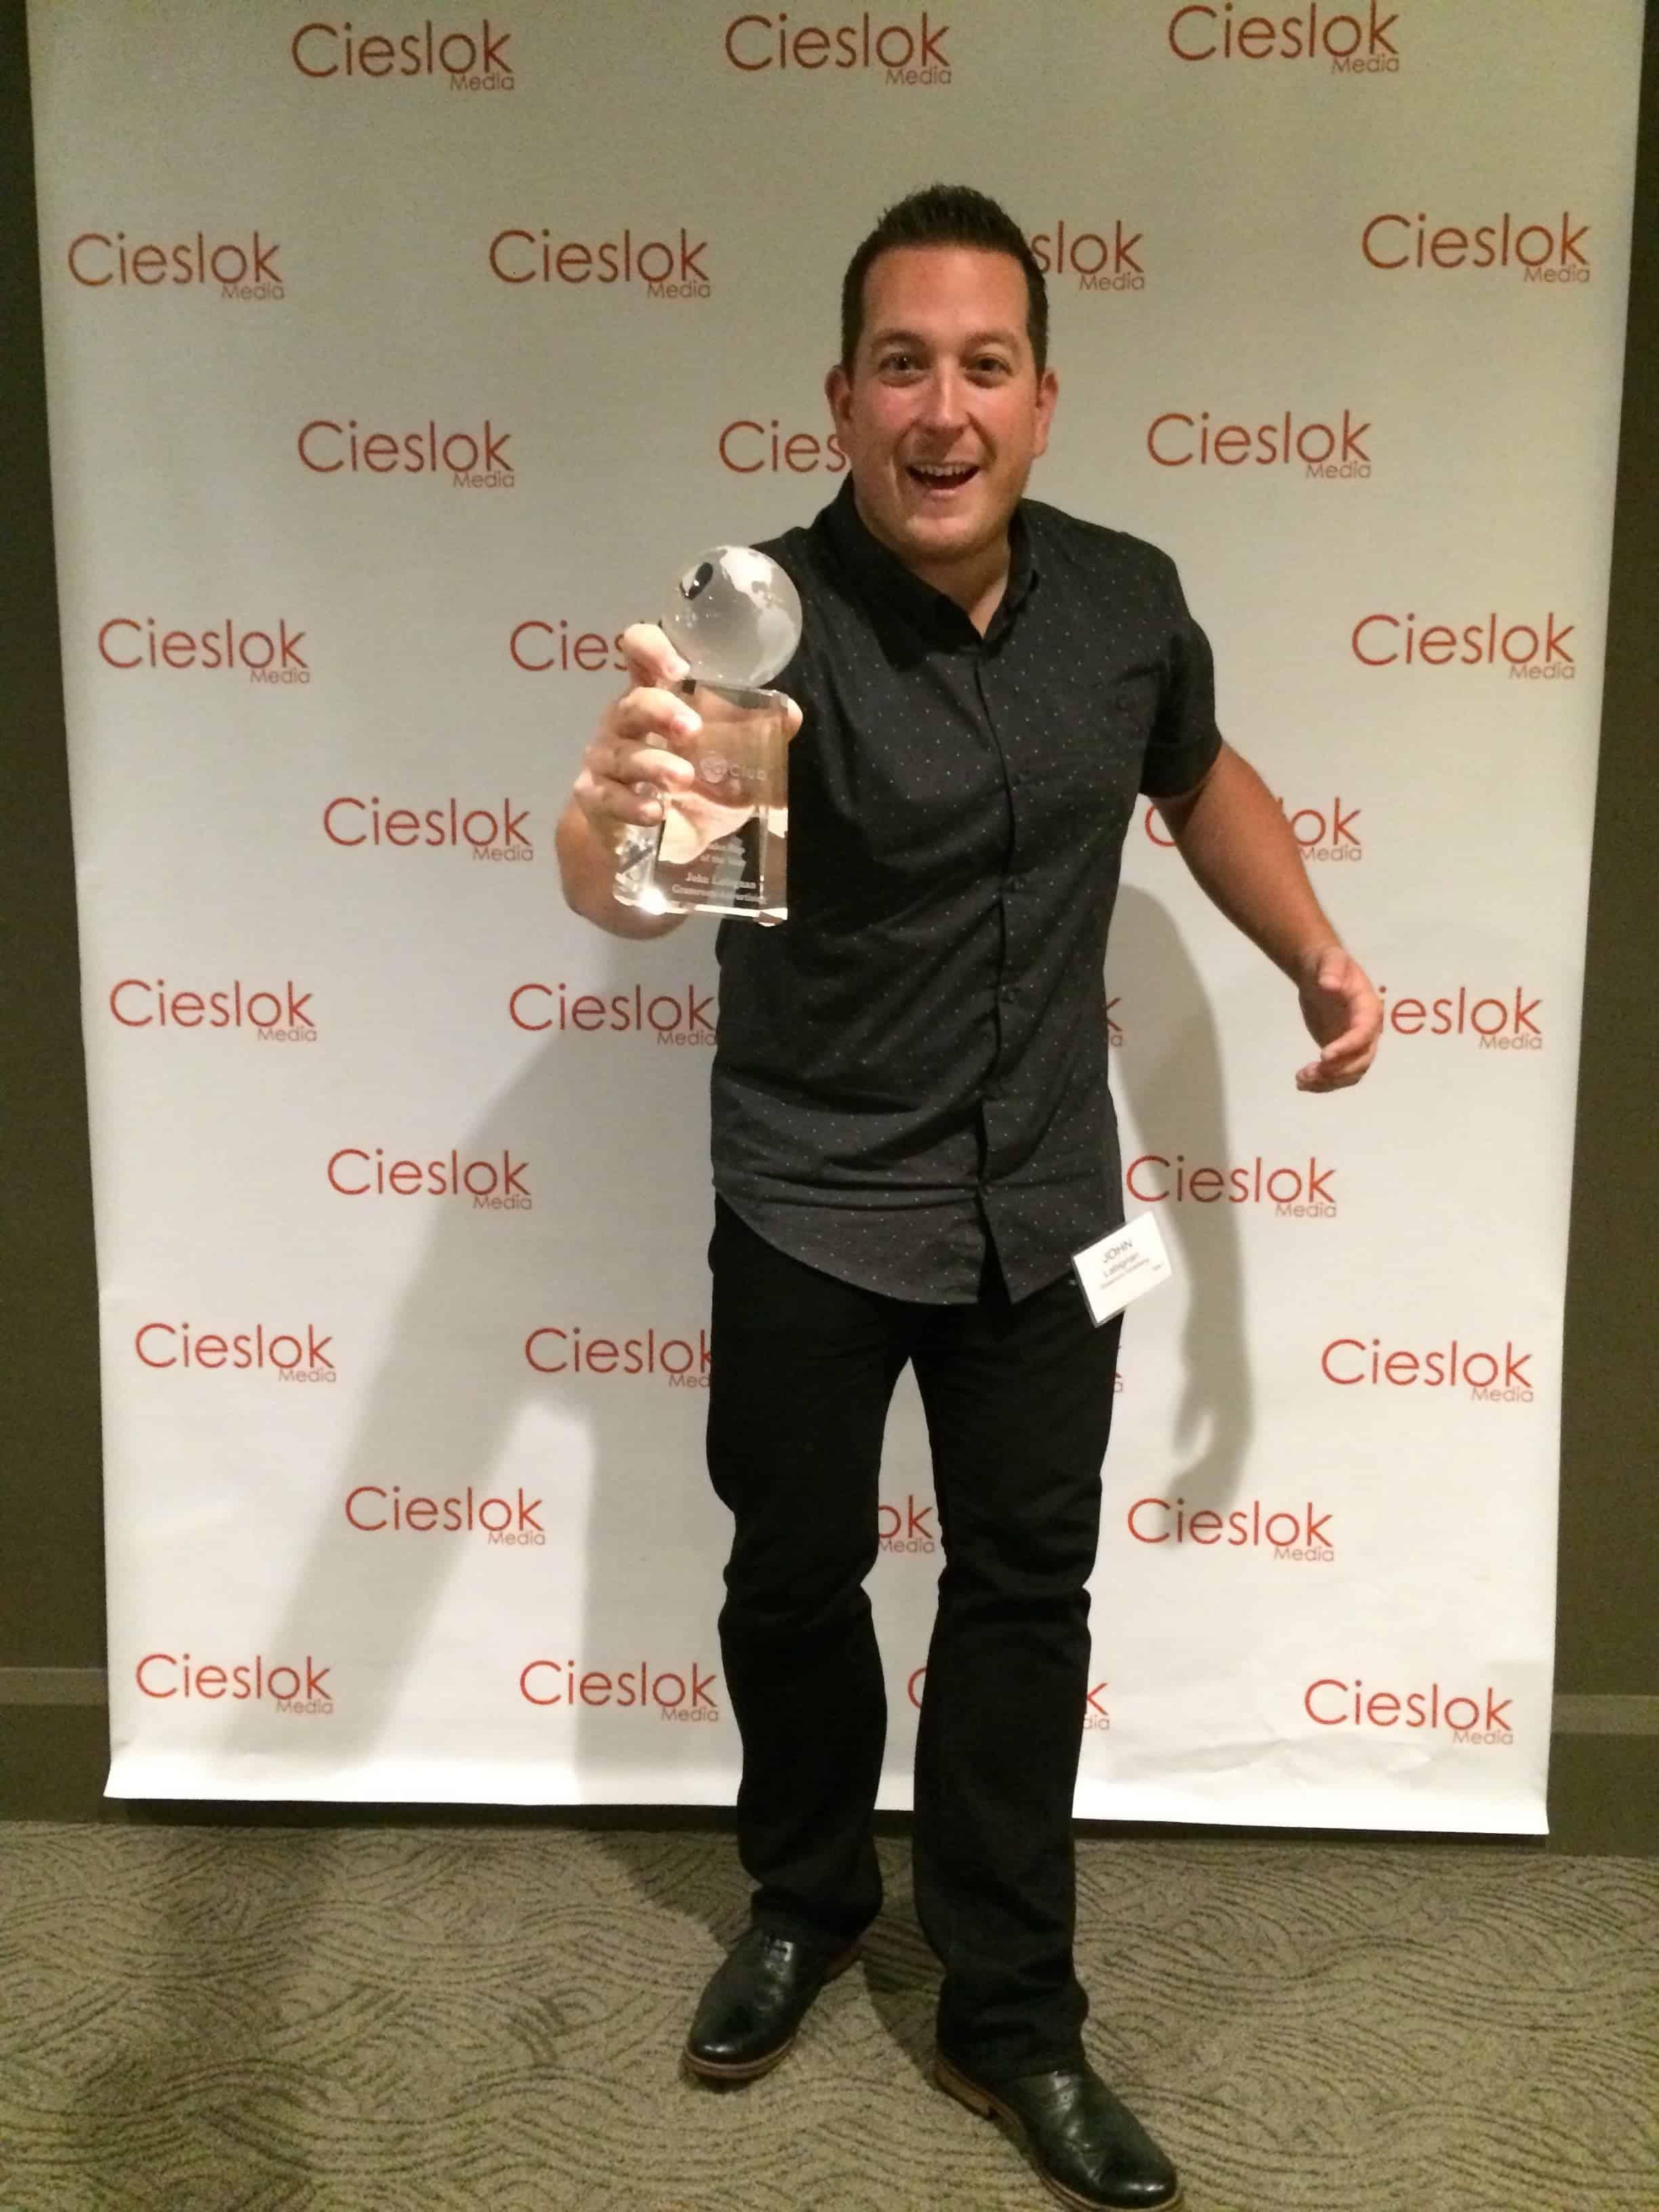 John wins the People's Choice Award!